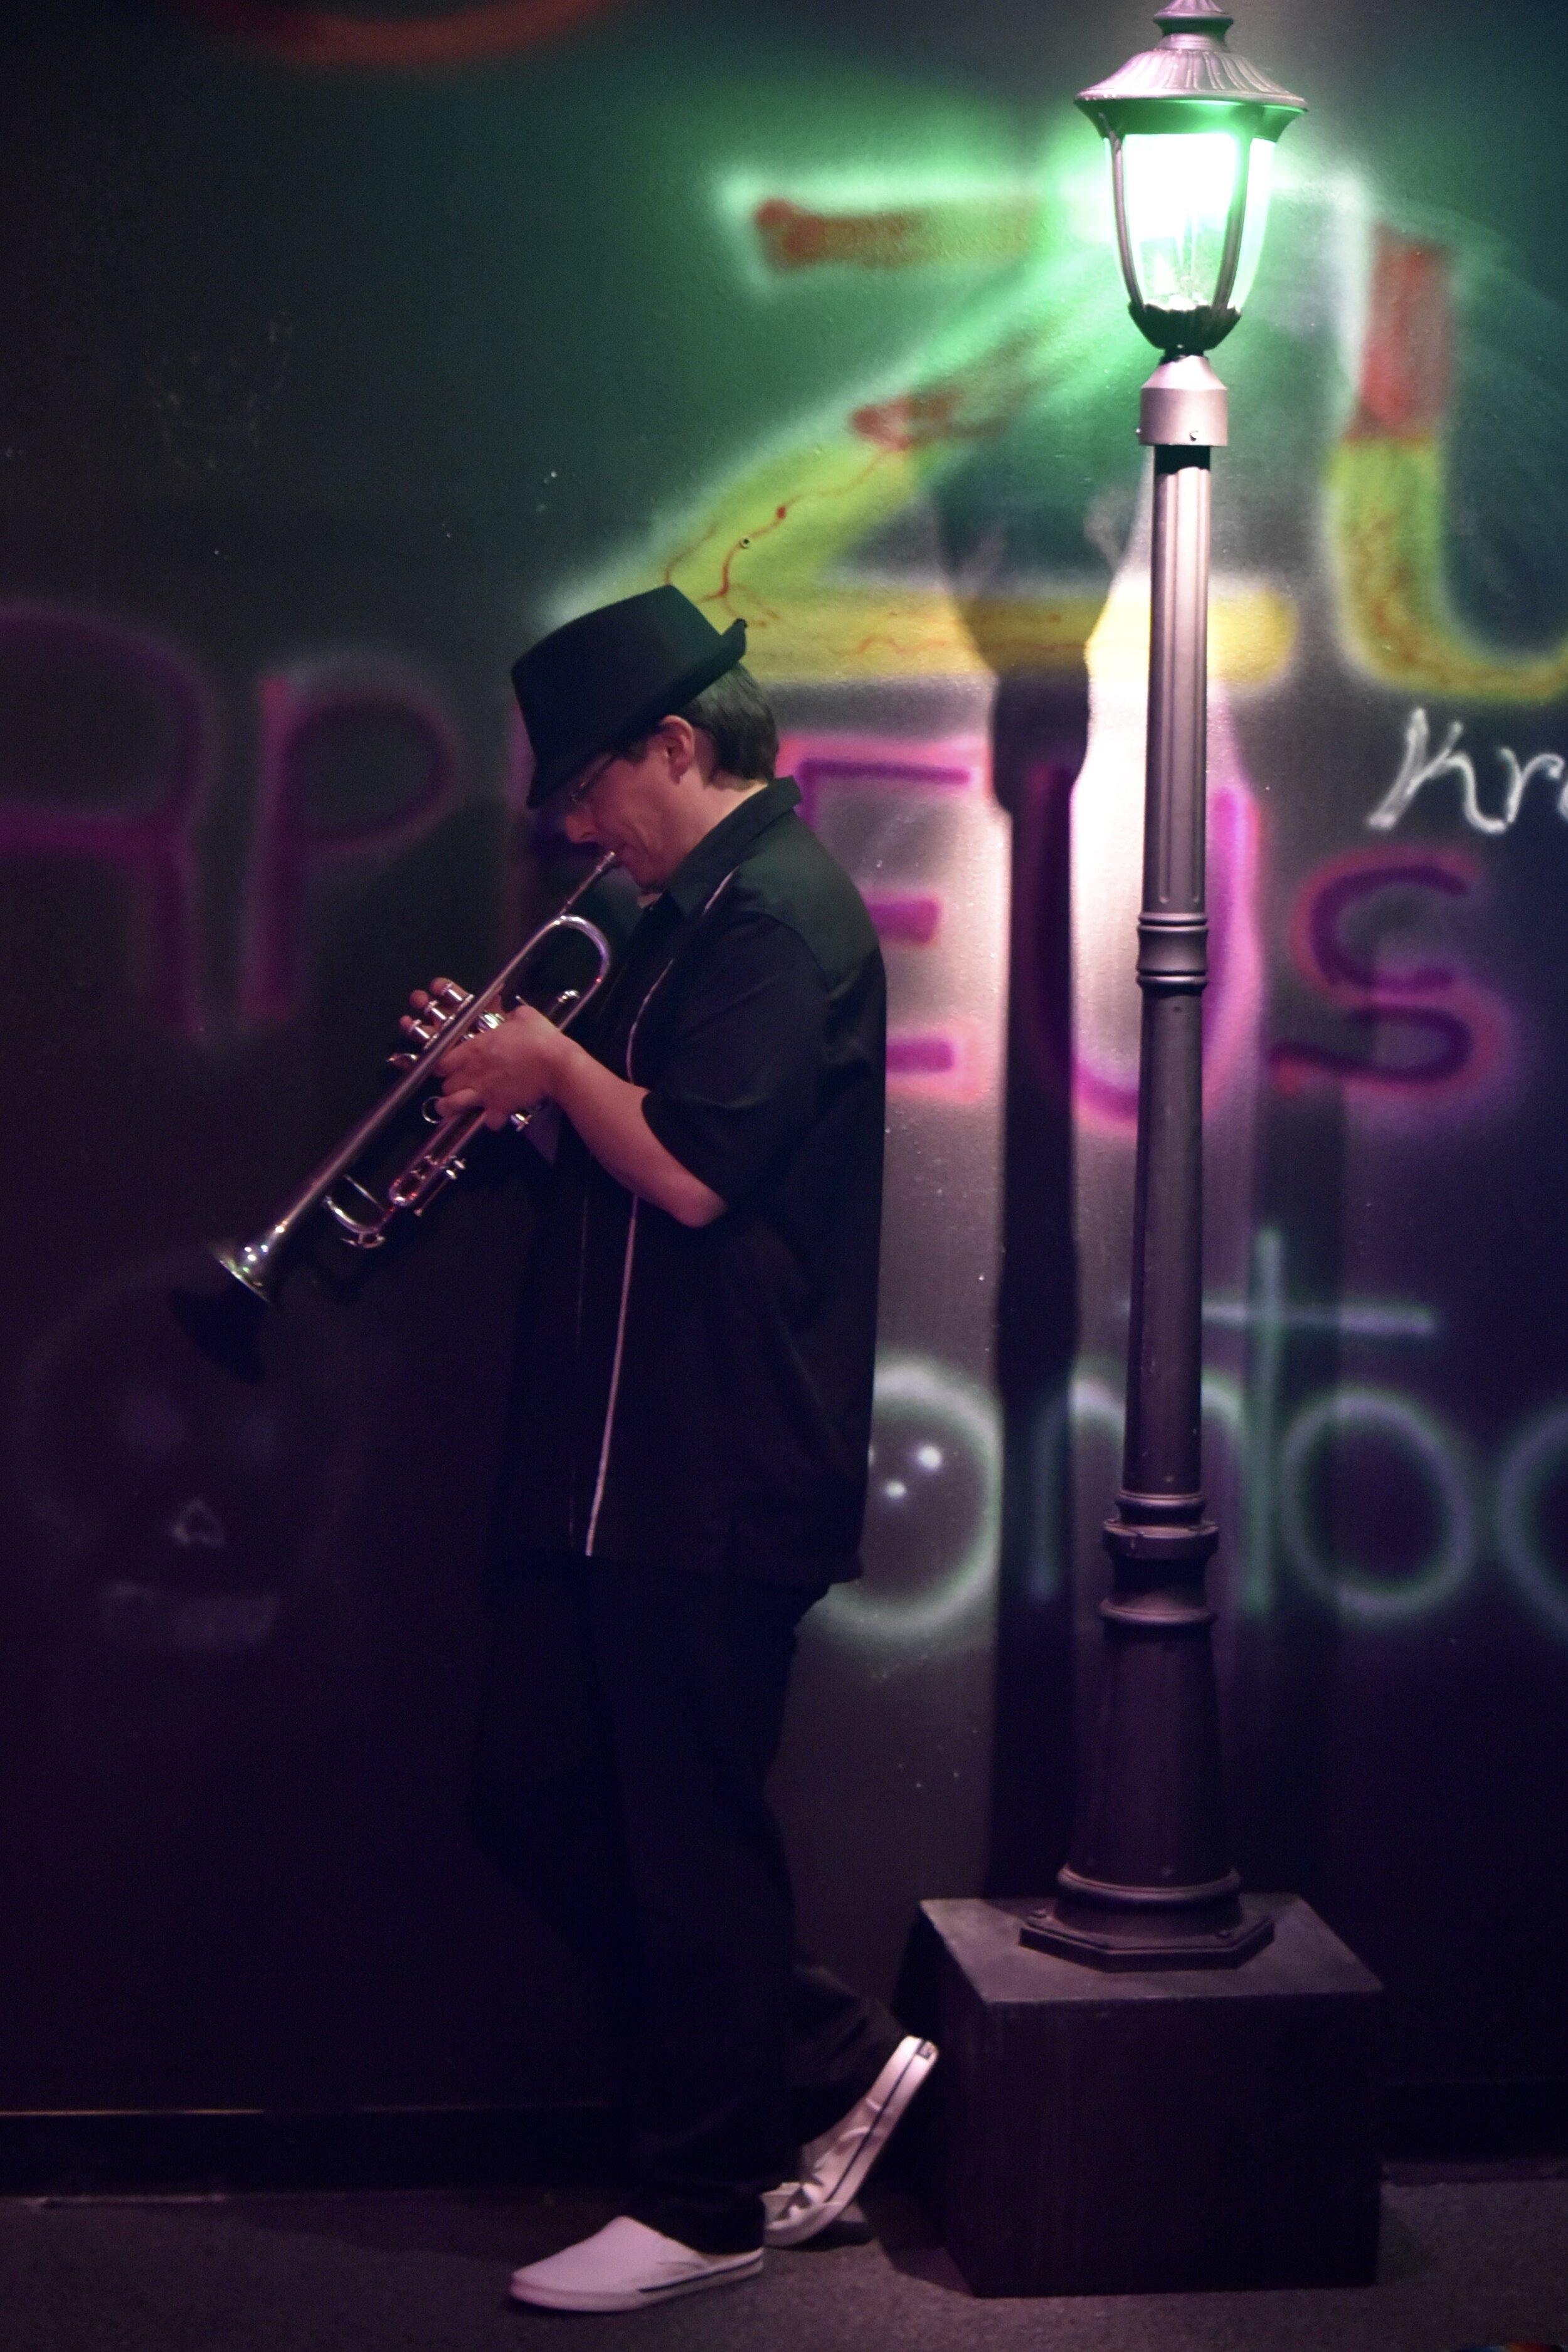 Todd Kadtke    as Musician